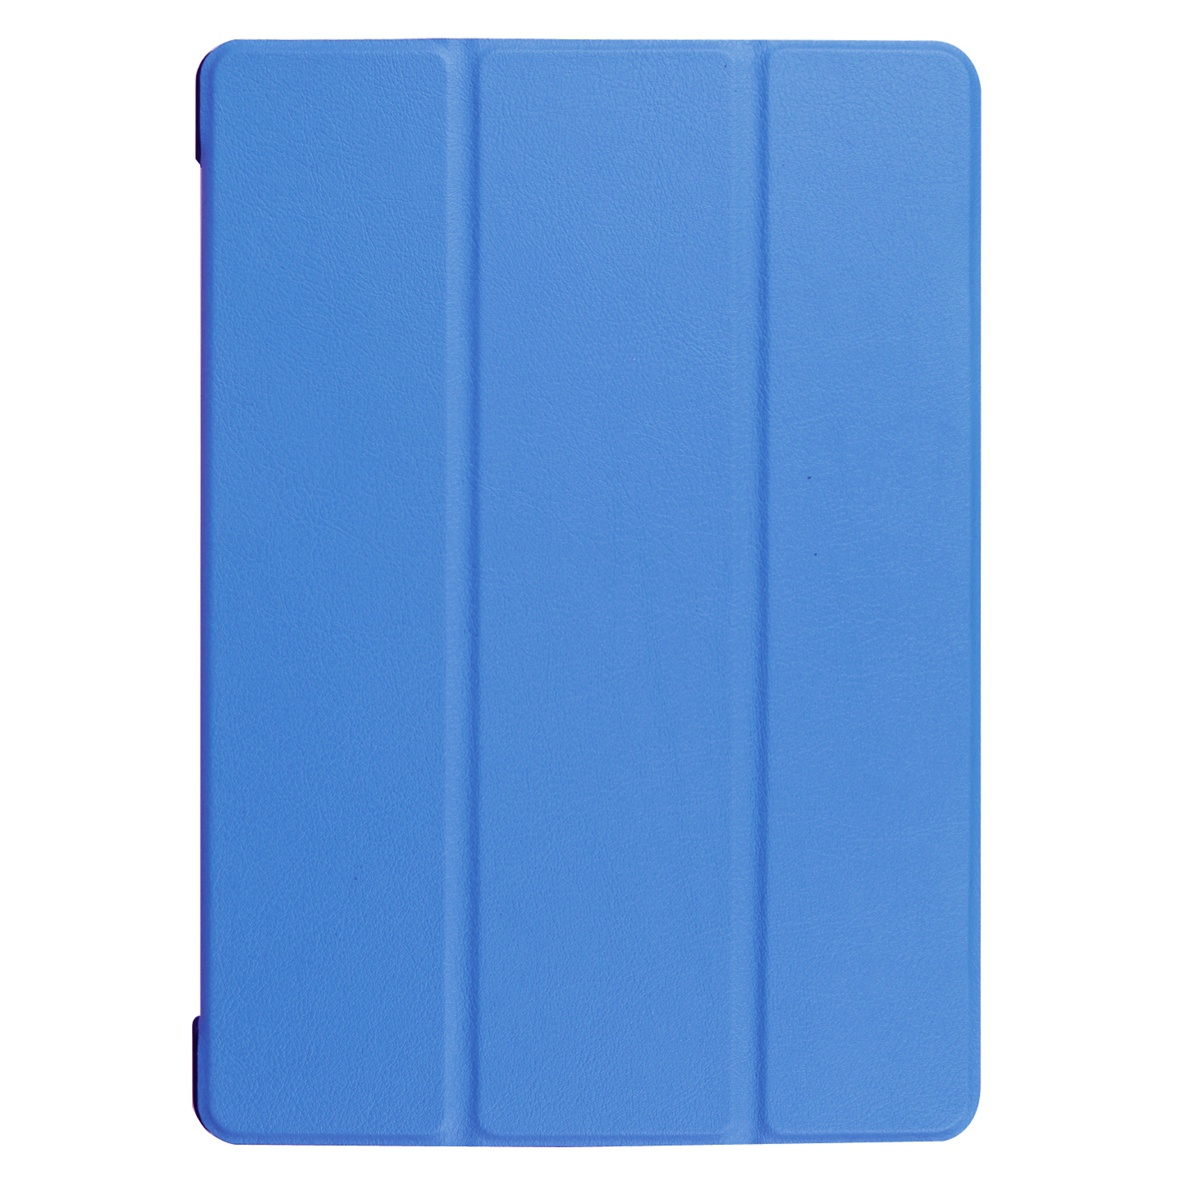 Для Huawei MediaPad T3 10.0 Ultra Slim Tri-Fold Stand Case Кожа PU Folio Tablet Protector Cover (Розовое золото) ultra thin pu leather case cover for huawei mediapad m3 btv w09 btv dl09 8 4 inch tablet cases stylus film